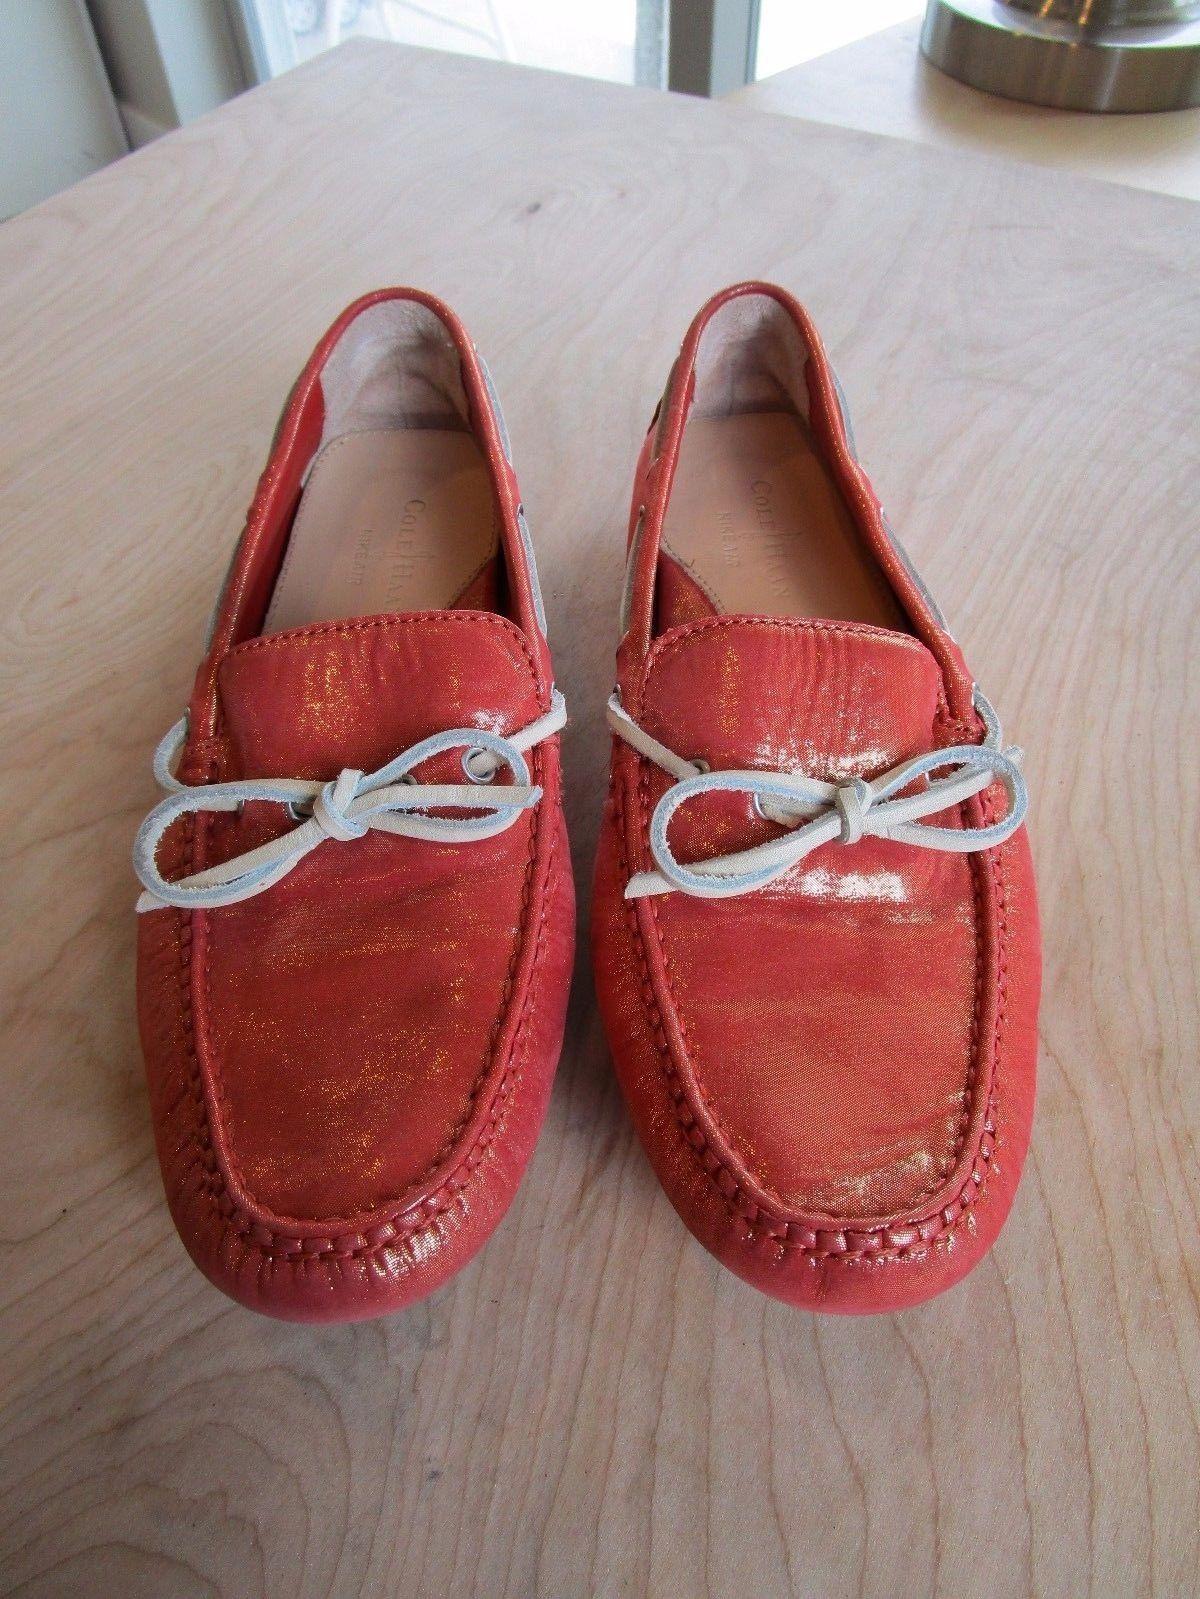 044c9d2f3f0  Women  Shoes windowpub.com Cole Haan Nike Air Burnt Orange Shimmer Loafer  Boat Shoes Size Women s 7.5 B  Women  Shoes windowpub.com